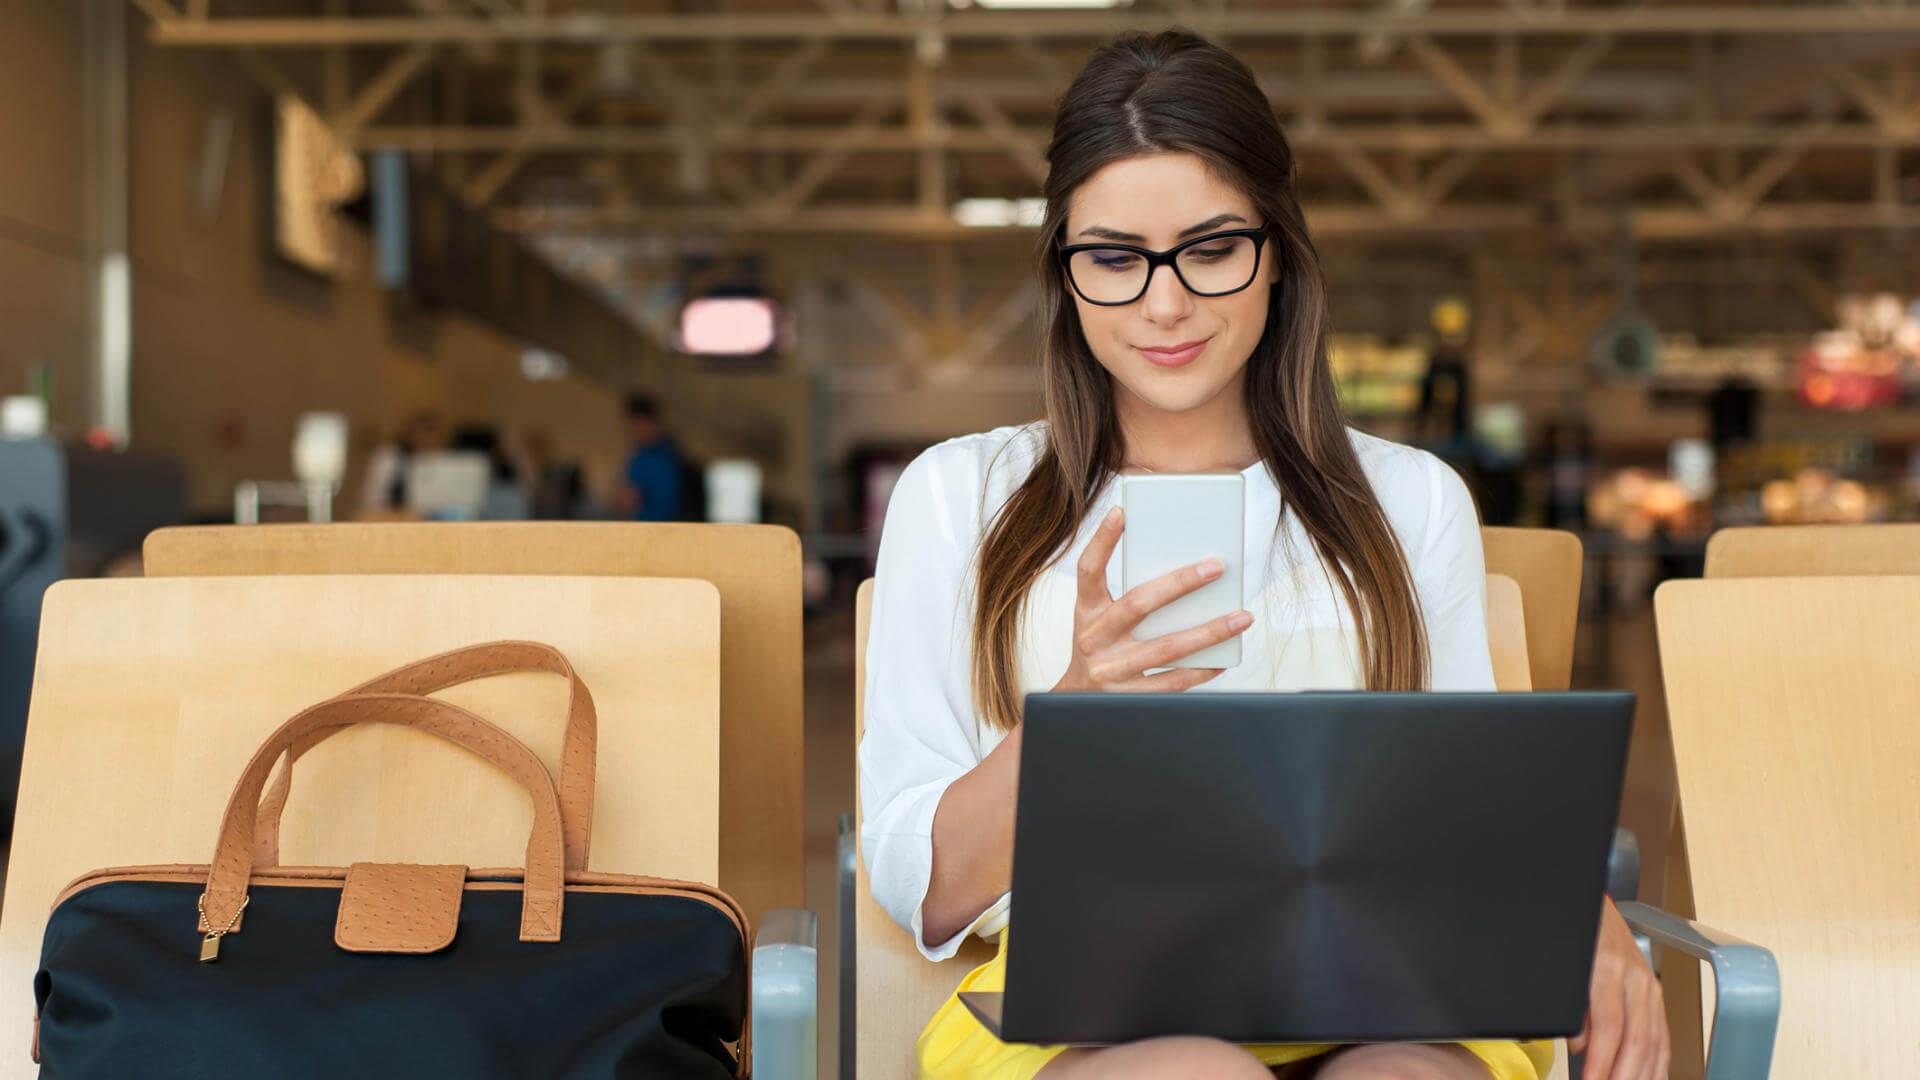 wifi aeropuertos chica usando wifi